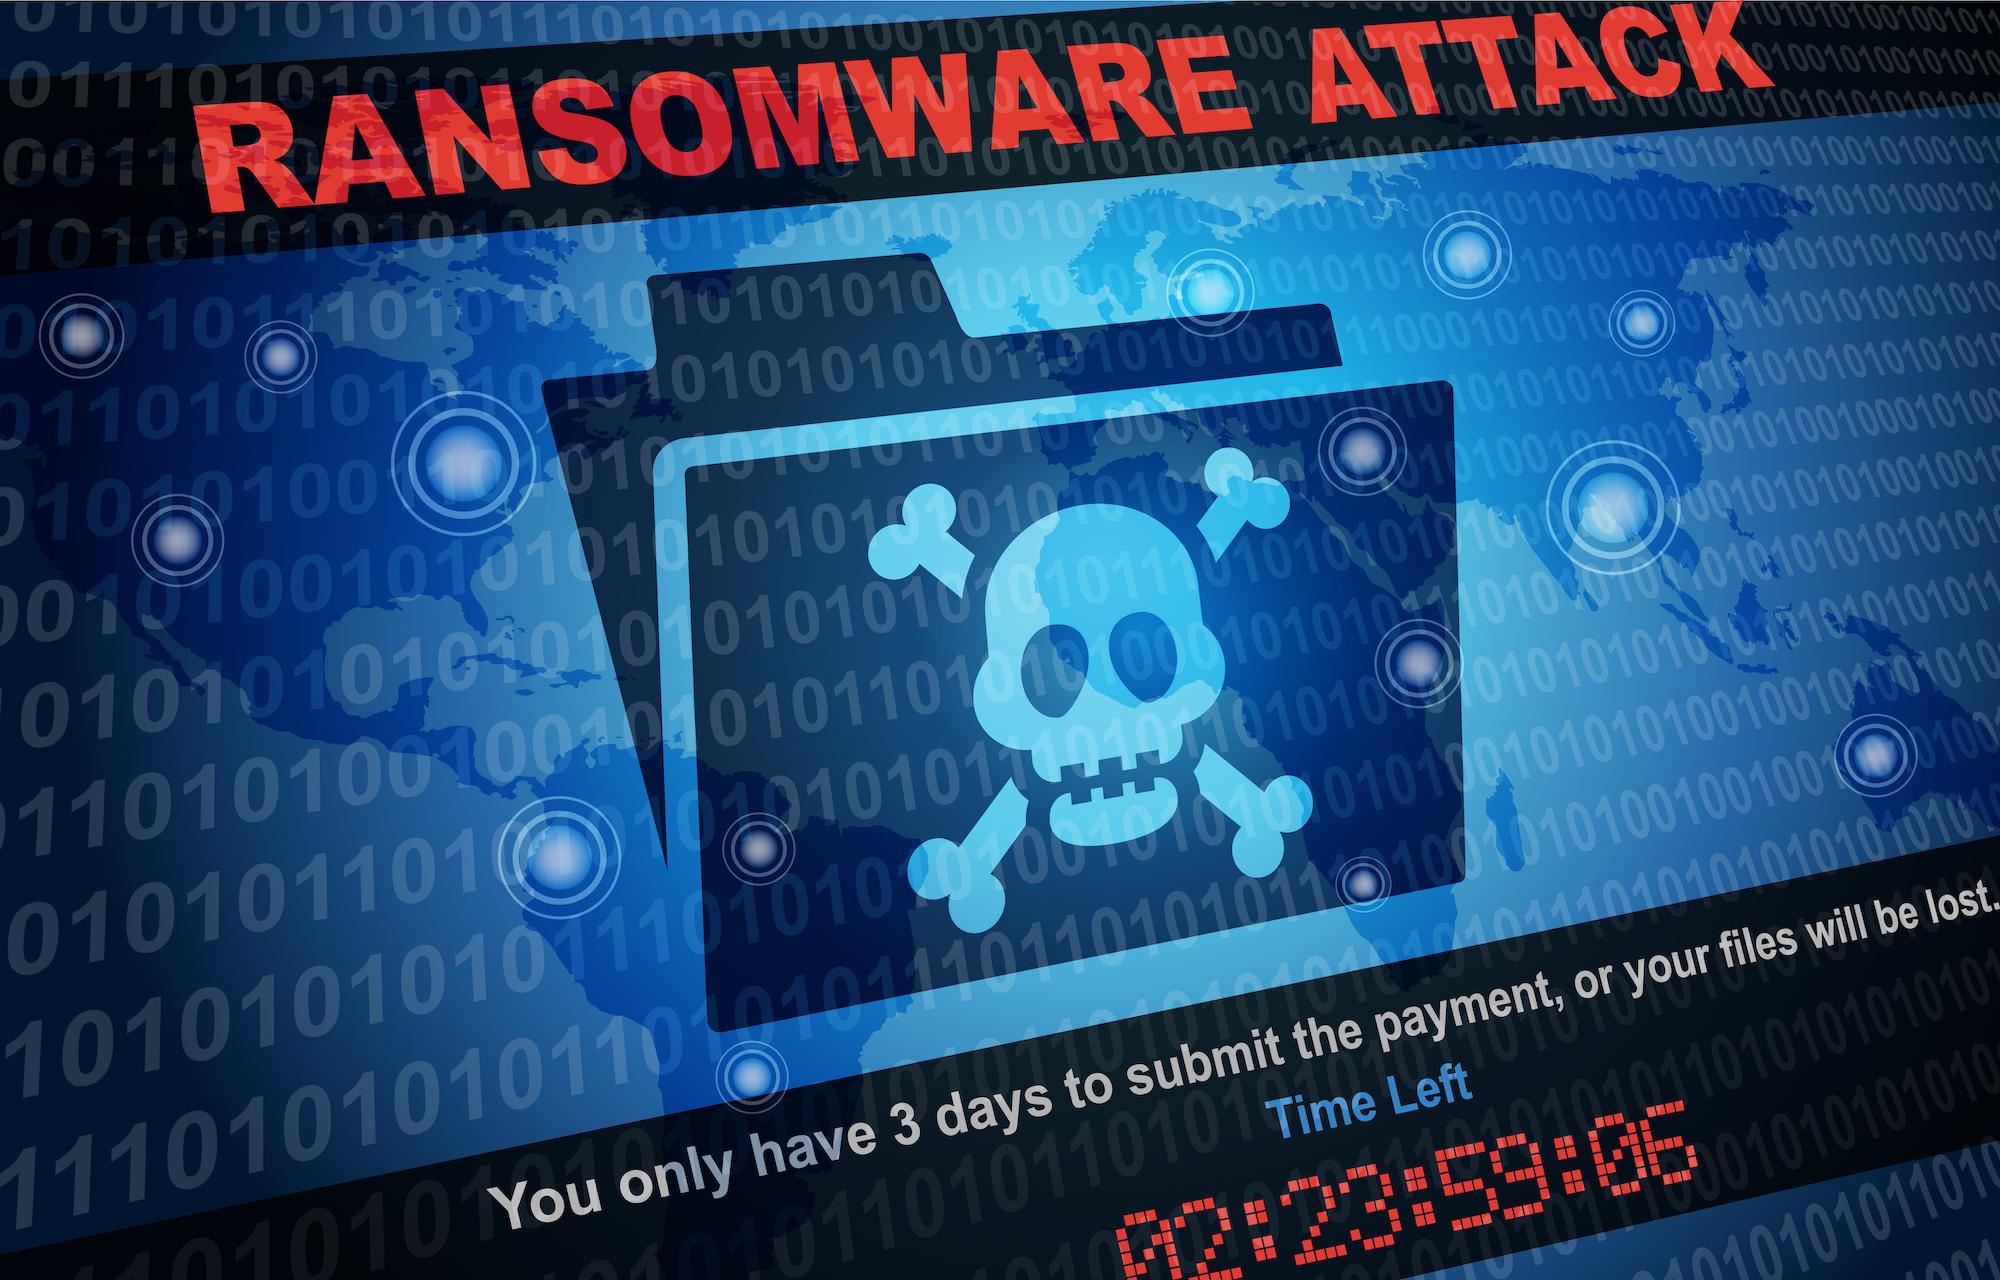 Photo of ransomware of PHI security on computer screen | Vanguard Communications | Denver, CO | San Jose, CA | Jacksonville, FL